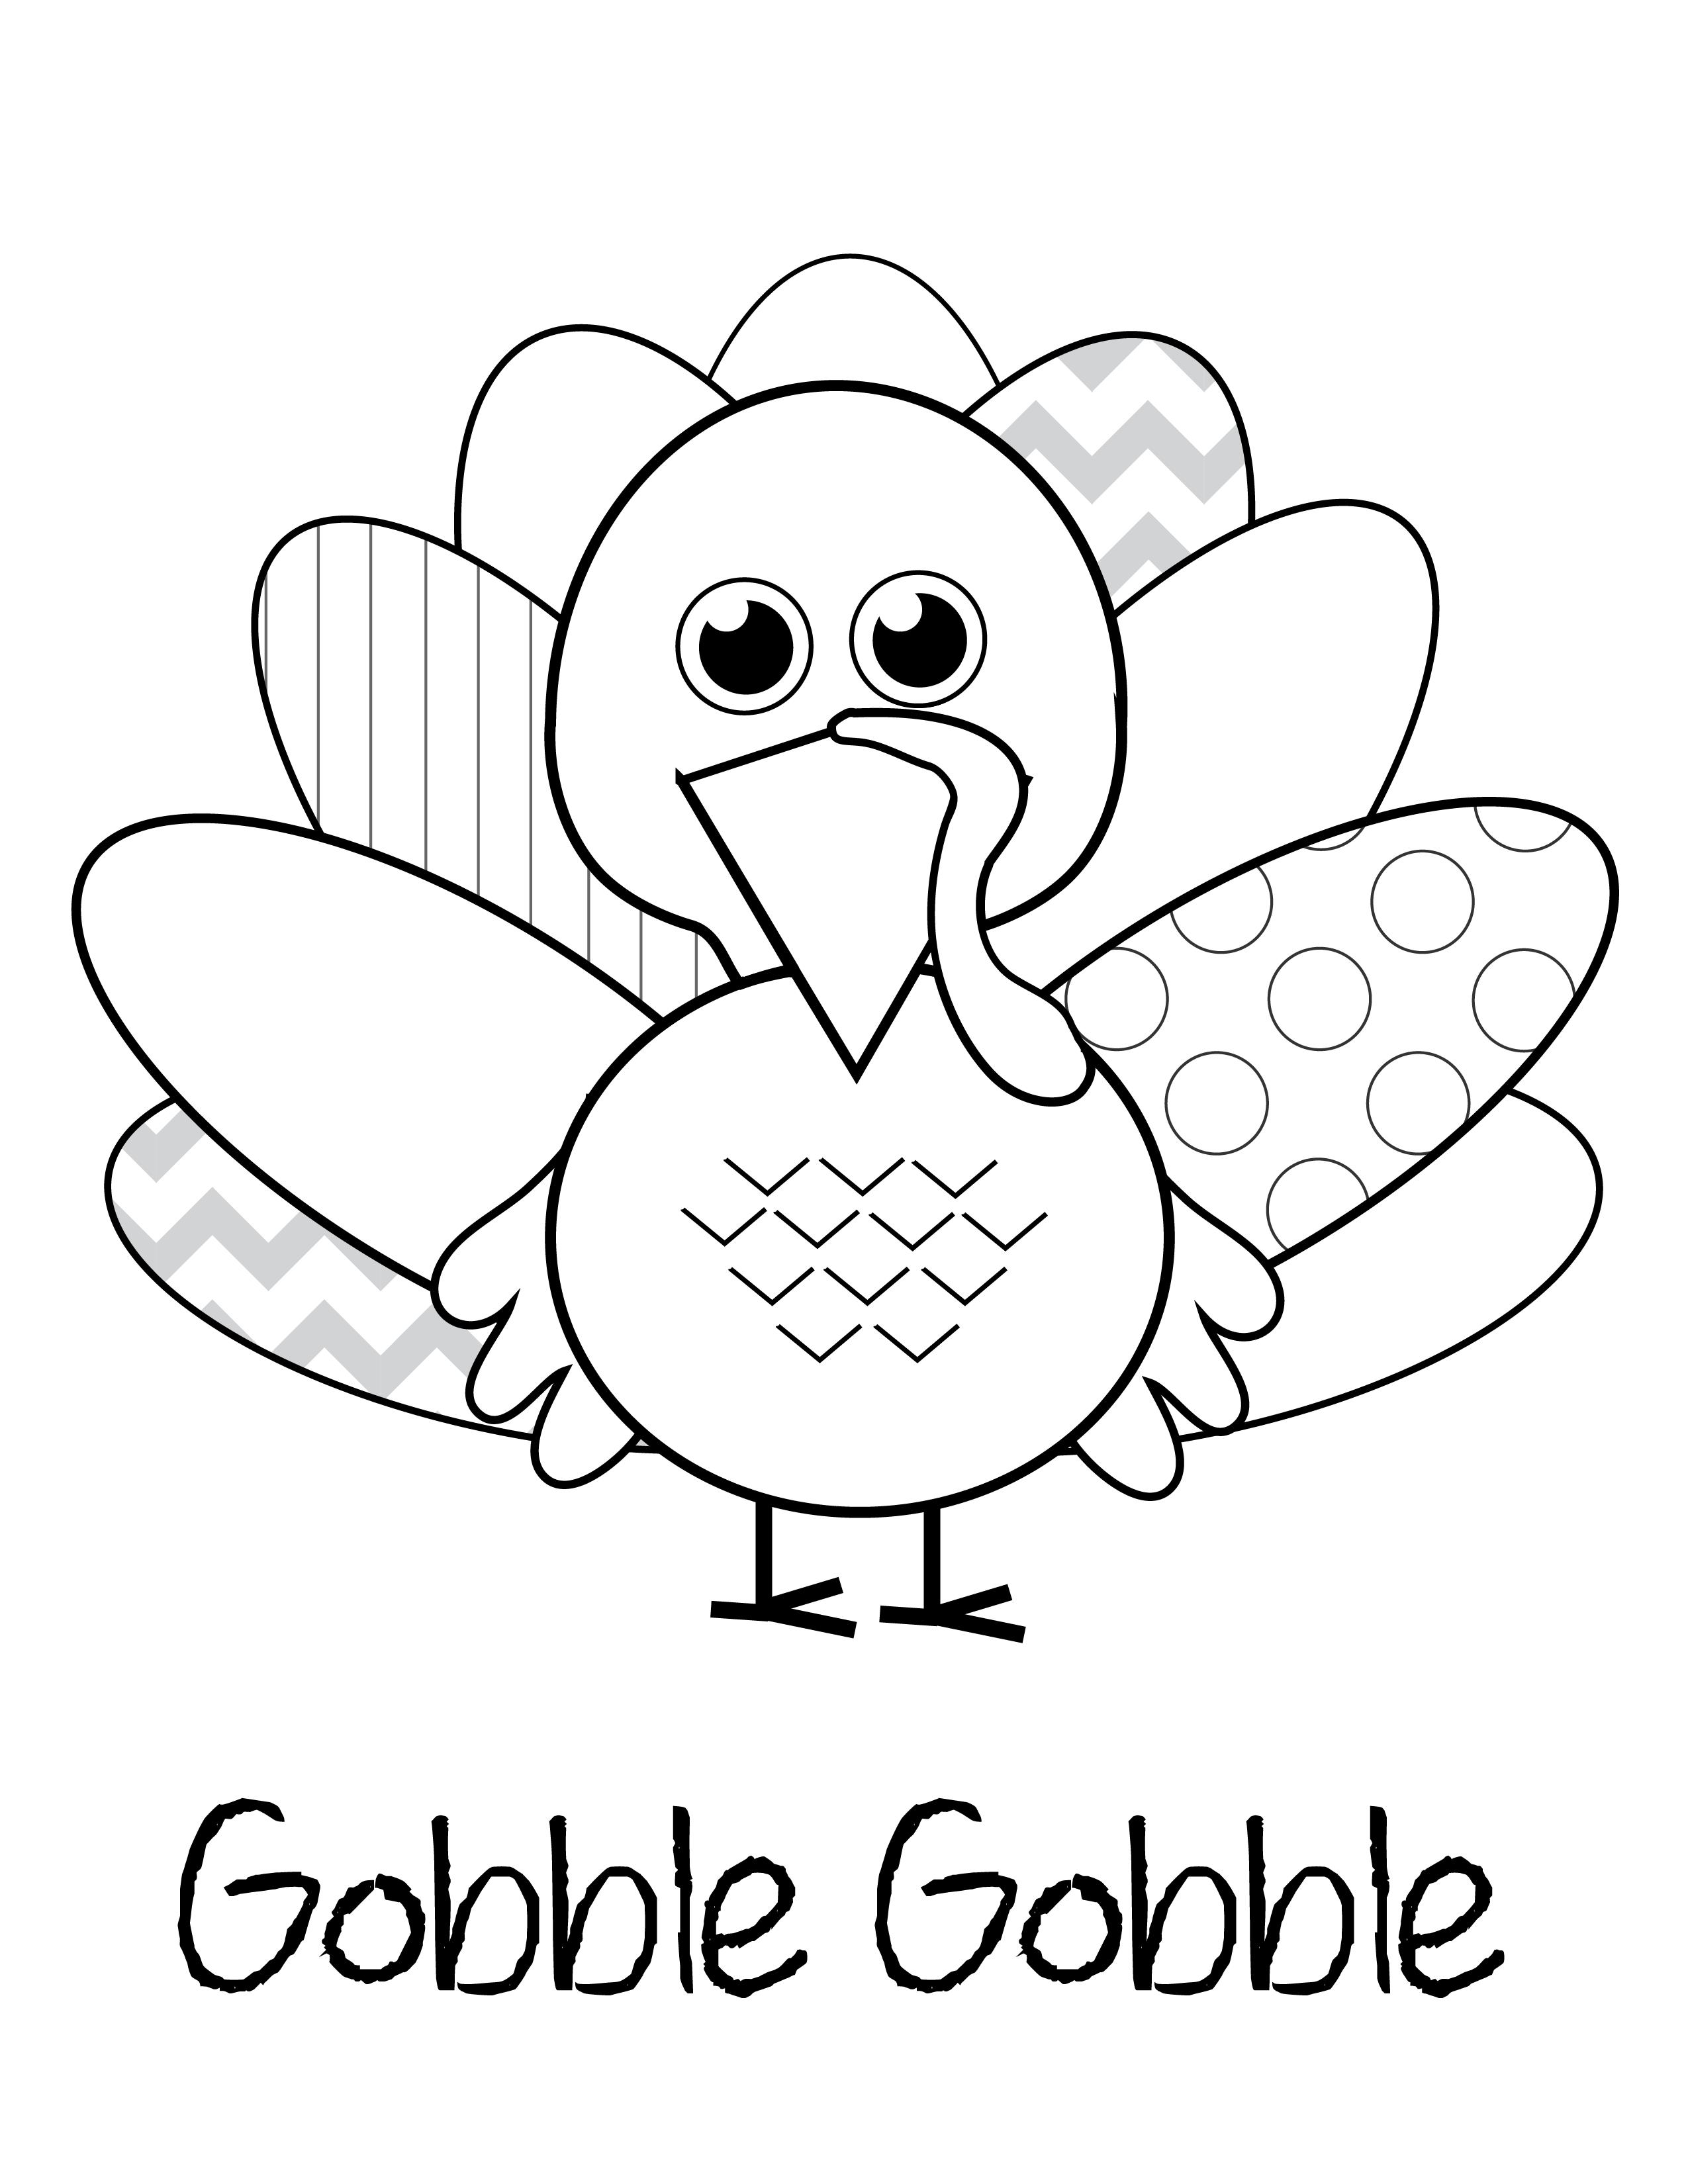 Pin By Amanda Artsy Momma On Kids Thanksgiving Ideas Free Thanksgiving Coloring Pages Thanksgiving Coloring Sheets Thanksgiving Coloring Pages